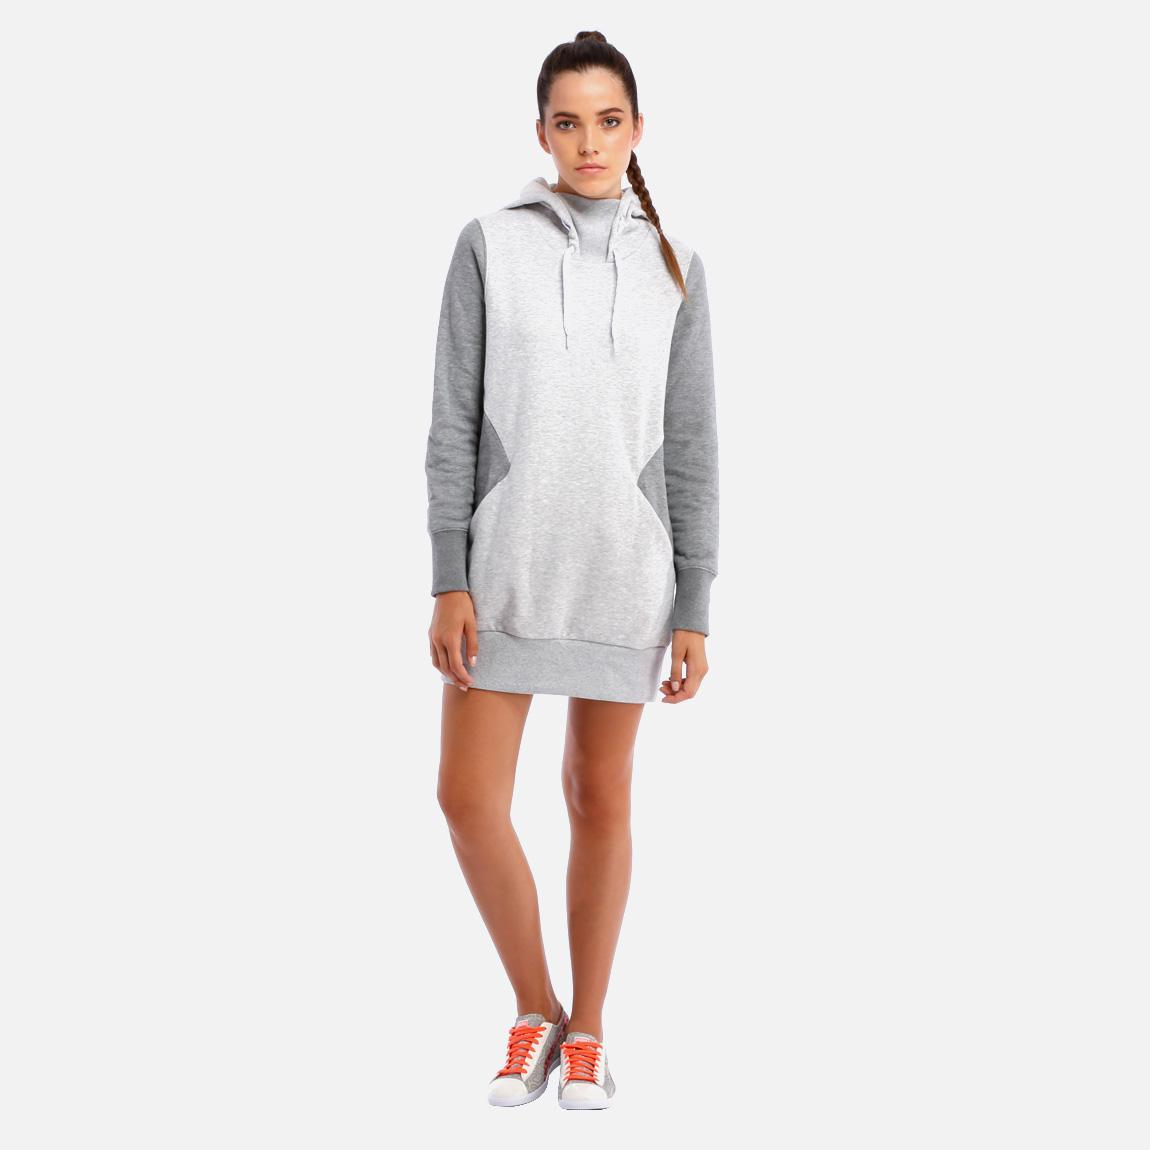 Sweat dress light grey heather puma t shirts for How to not sweat through dress shirts